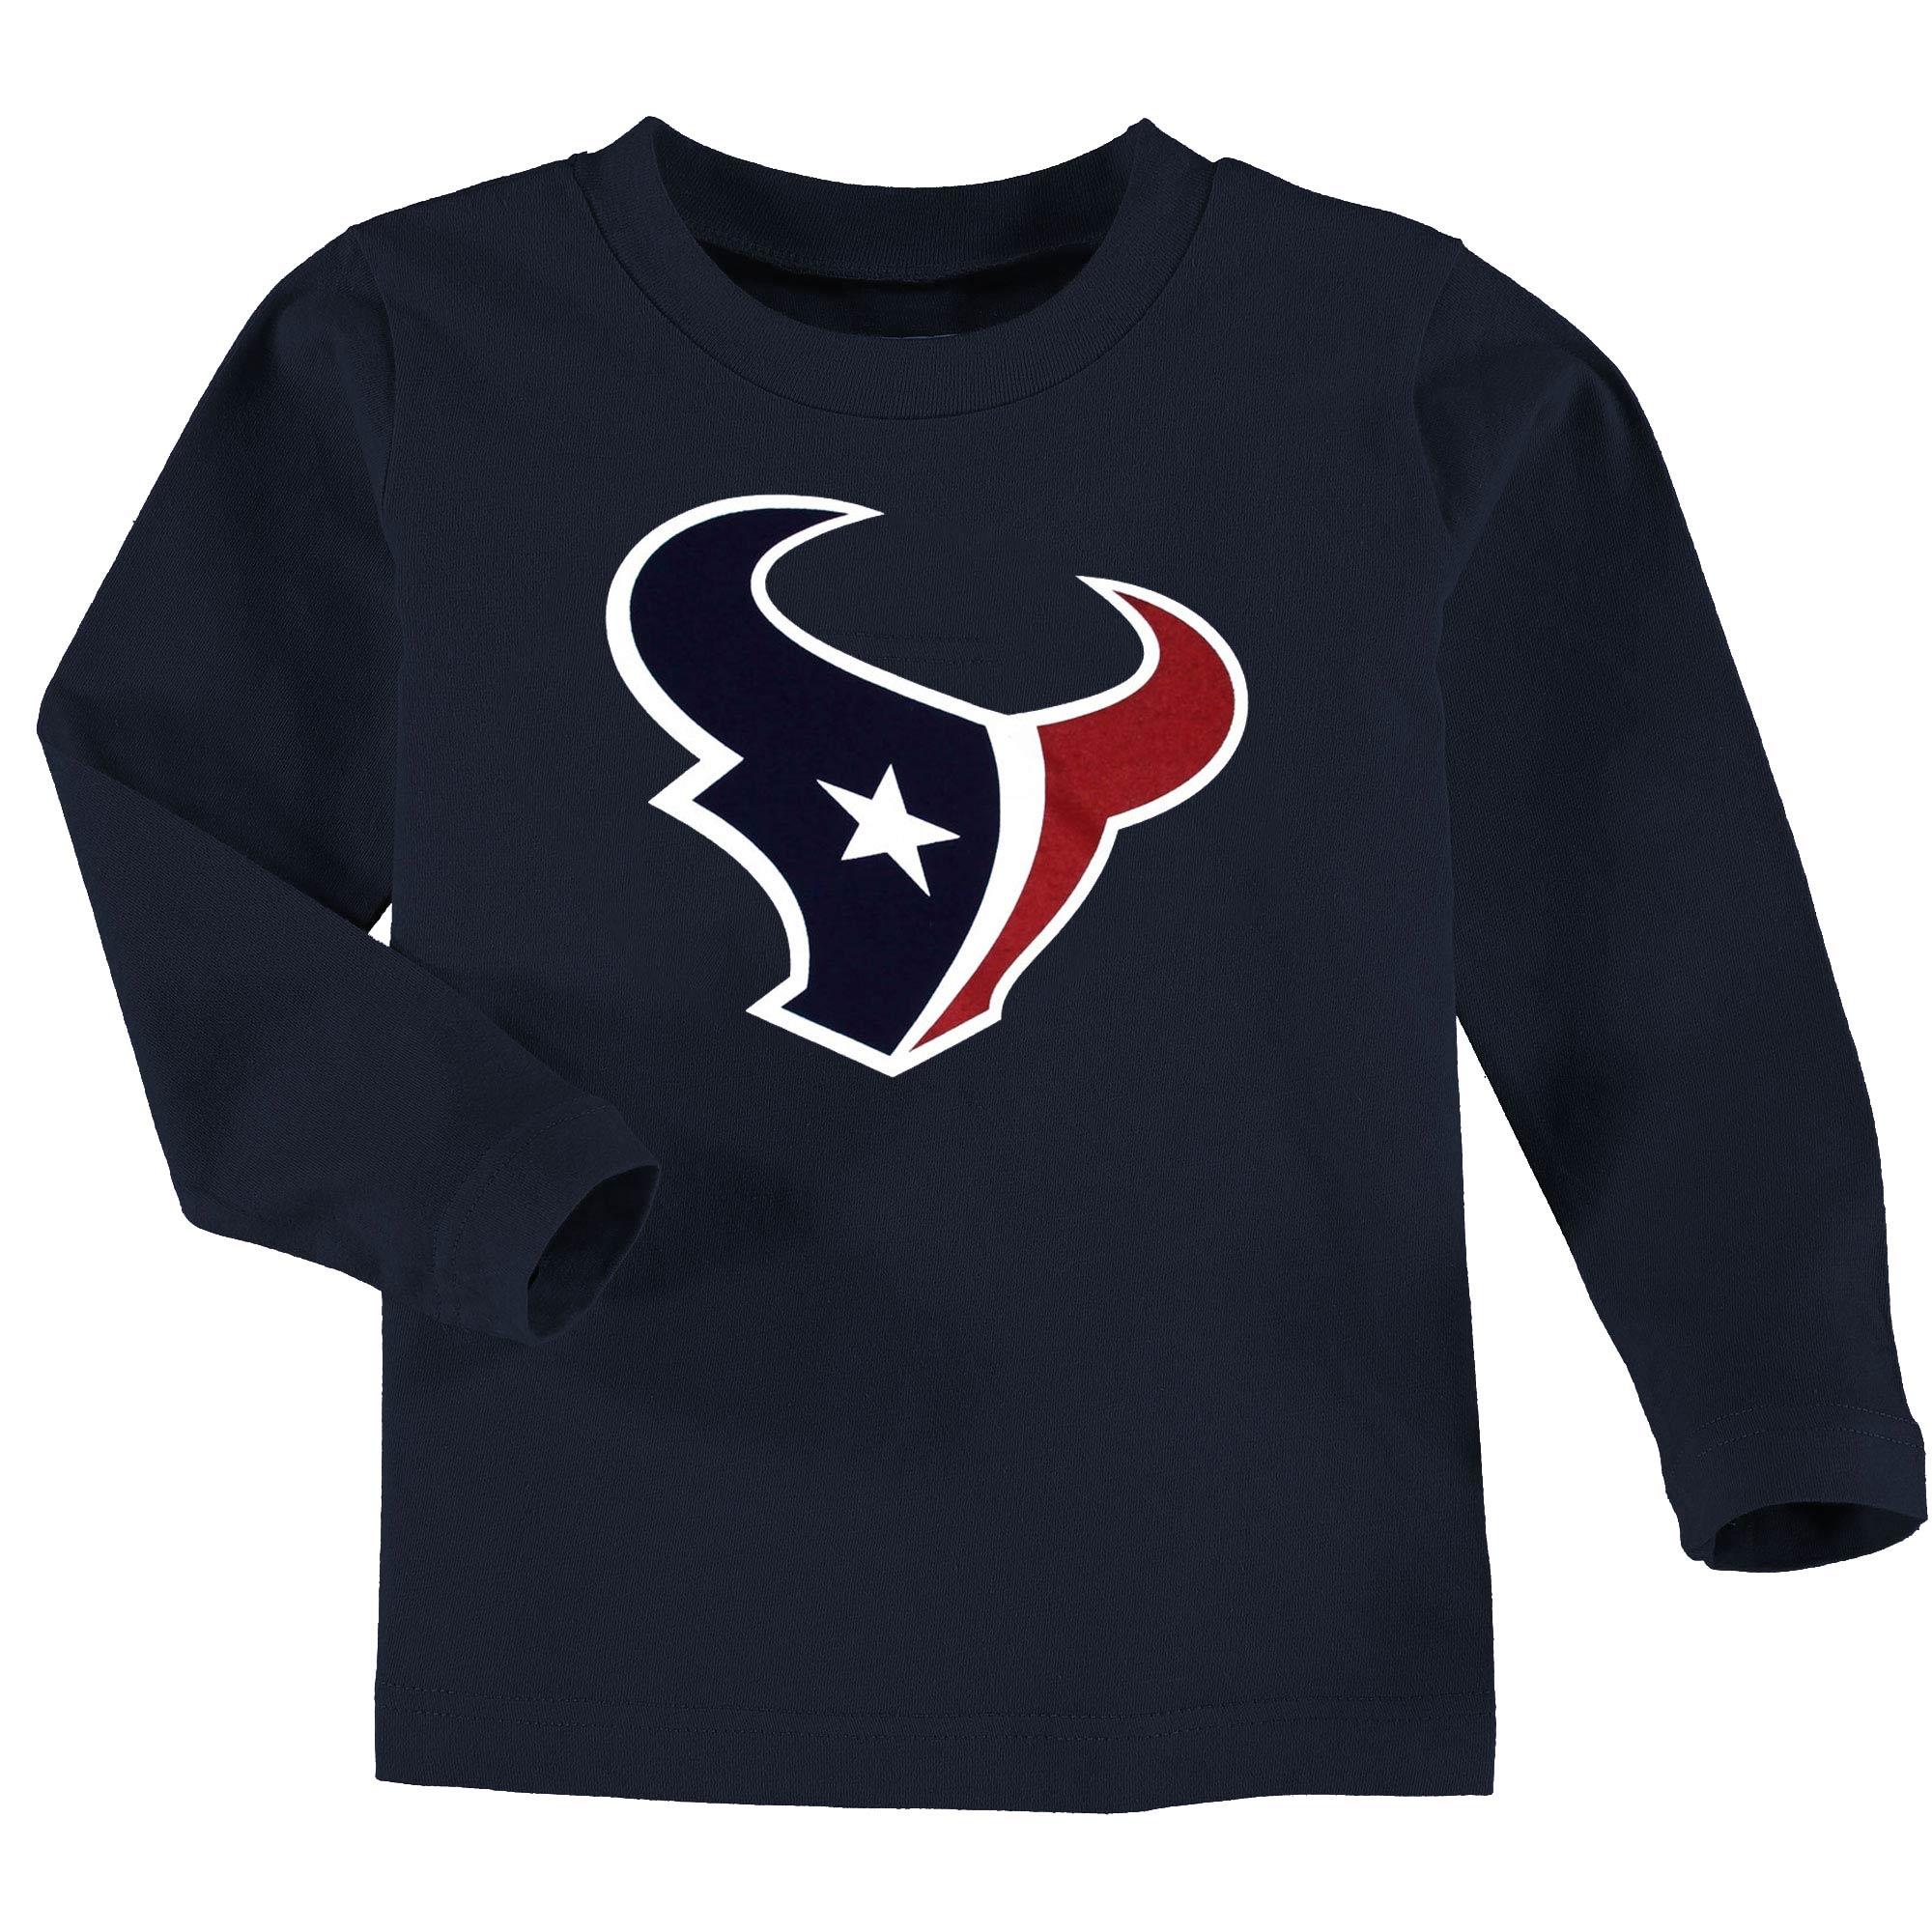 Houston Texans Toddler Team Logo Long Sleeve T-Shirt - Navy Blue